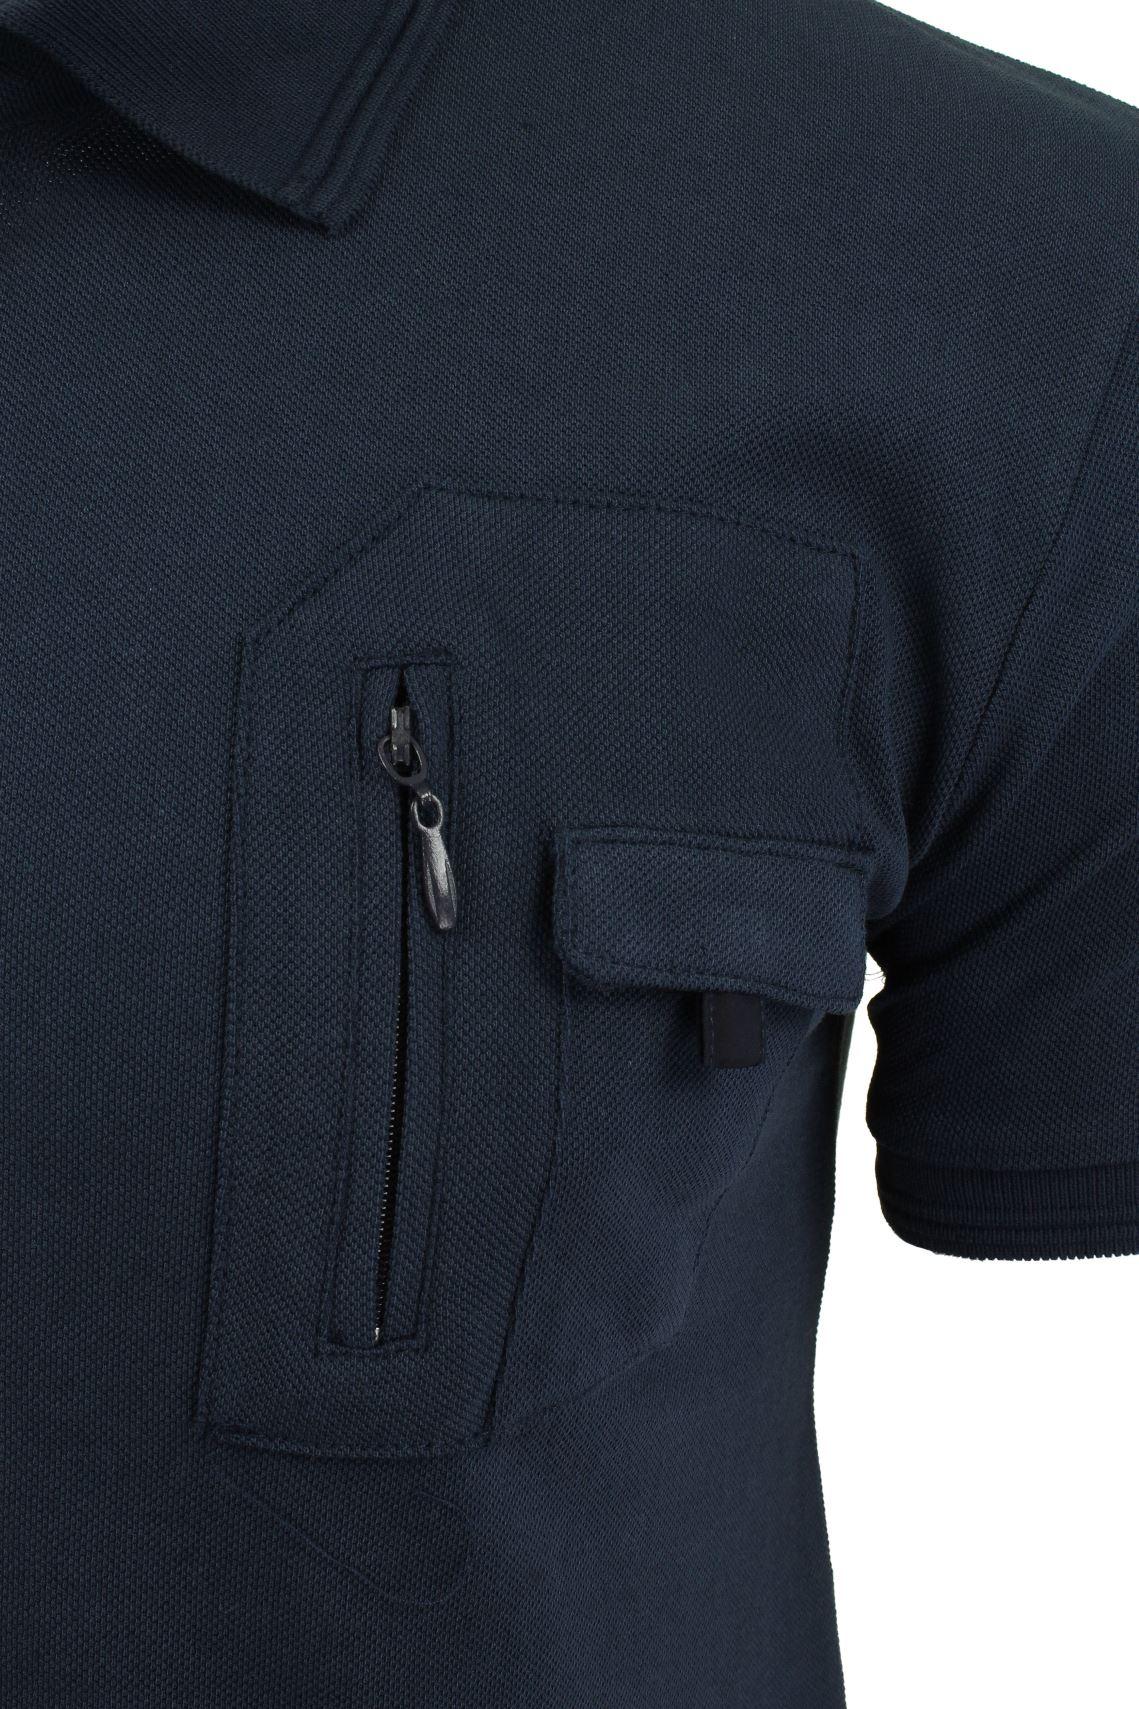 Camisa-Polo-para-hombre-Manga-corta-desde-el-apagon-Collection-by-Voi-Jeans miniatura 9